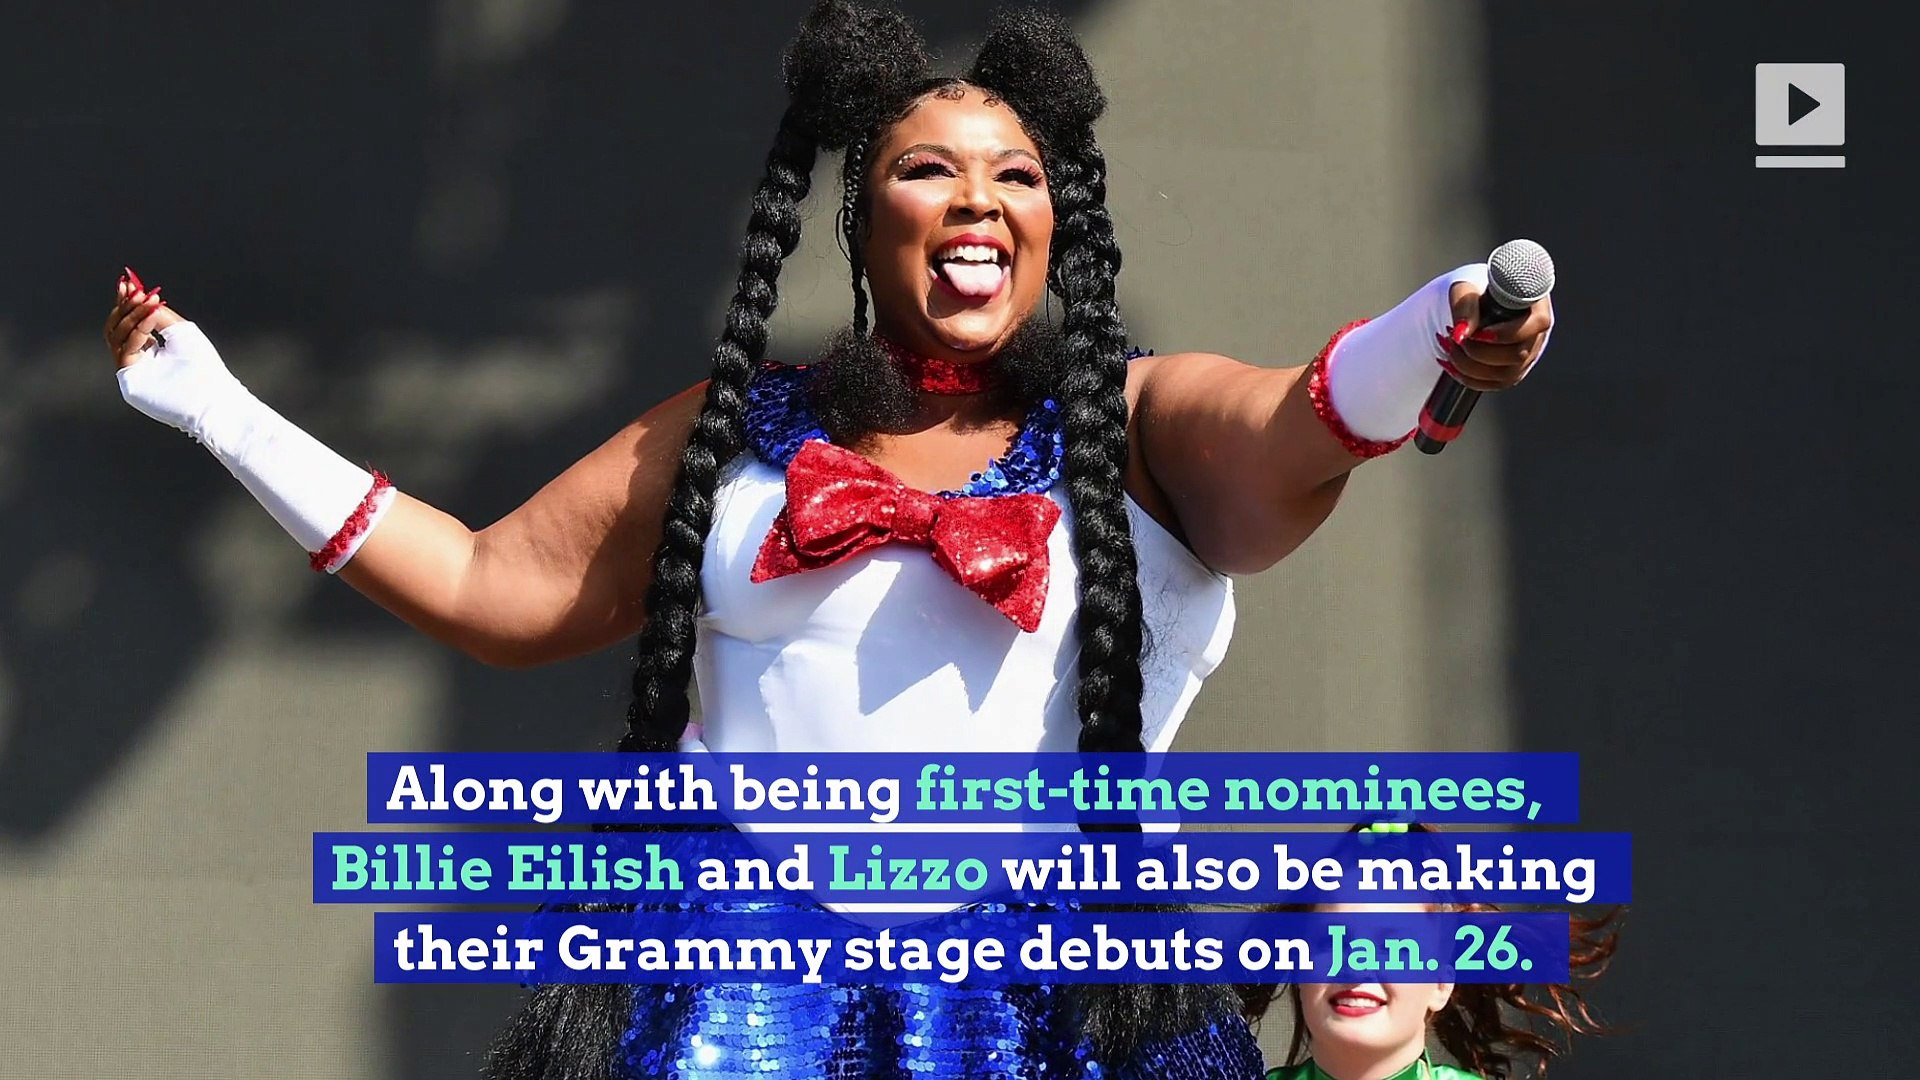 Billie Eilish, Lizzo and Aerosmith to Perform at 2020 Grammy Awards